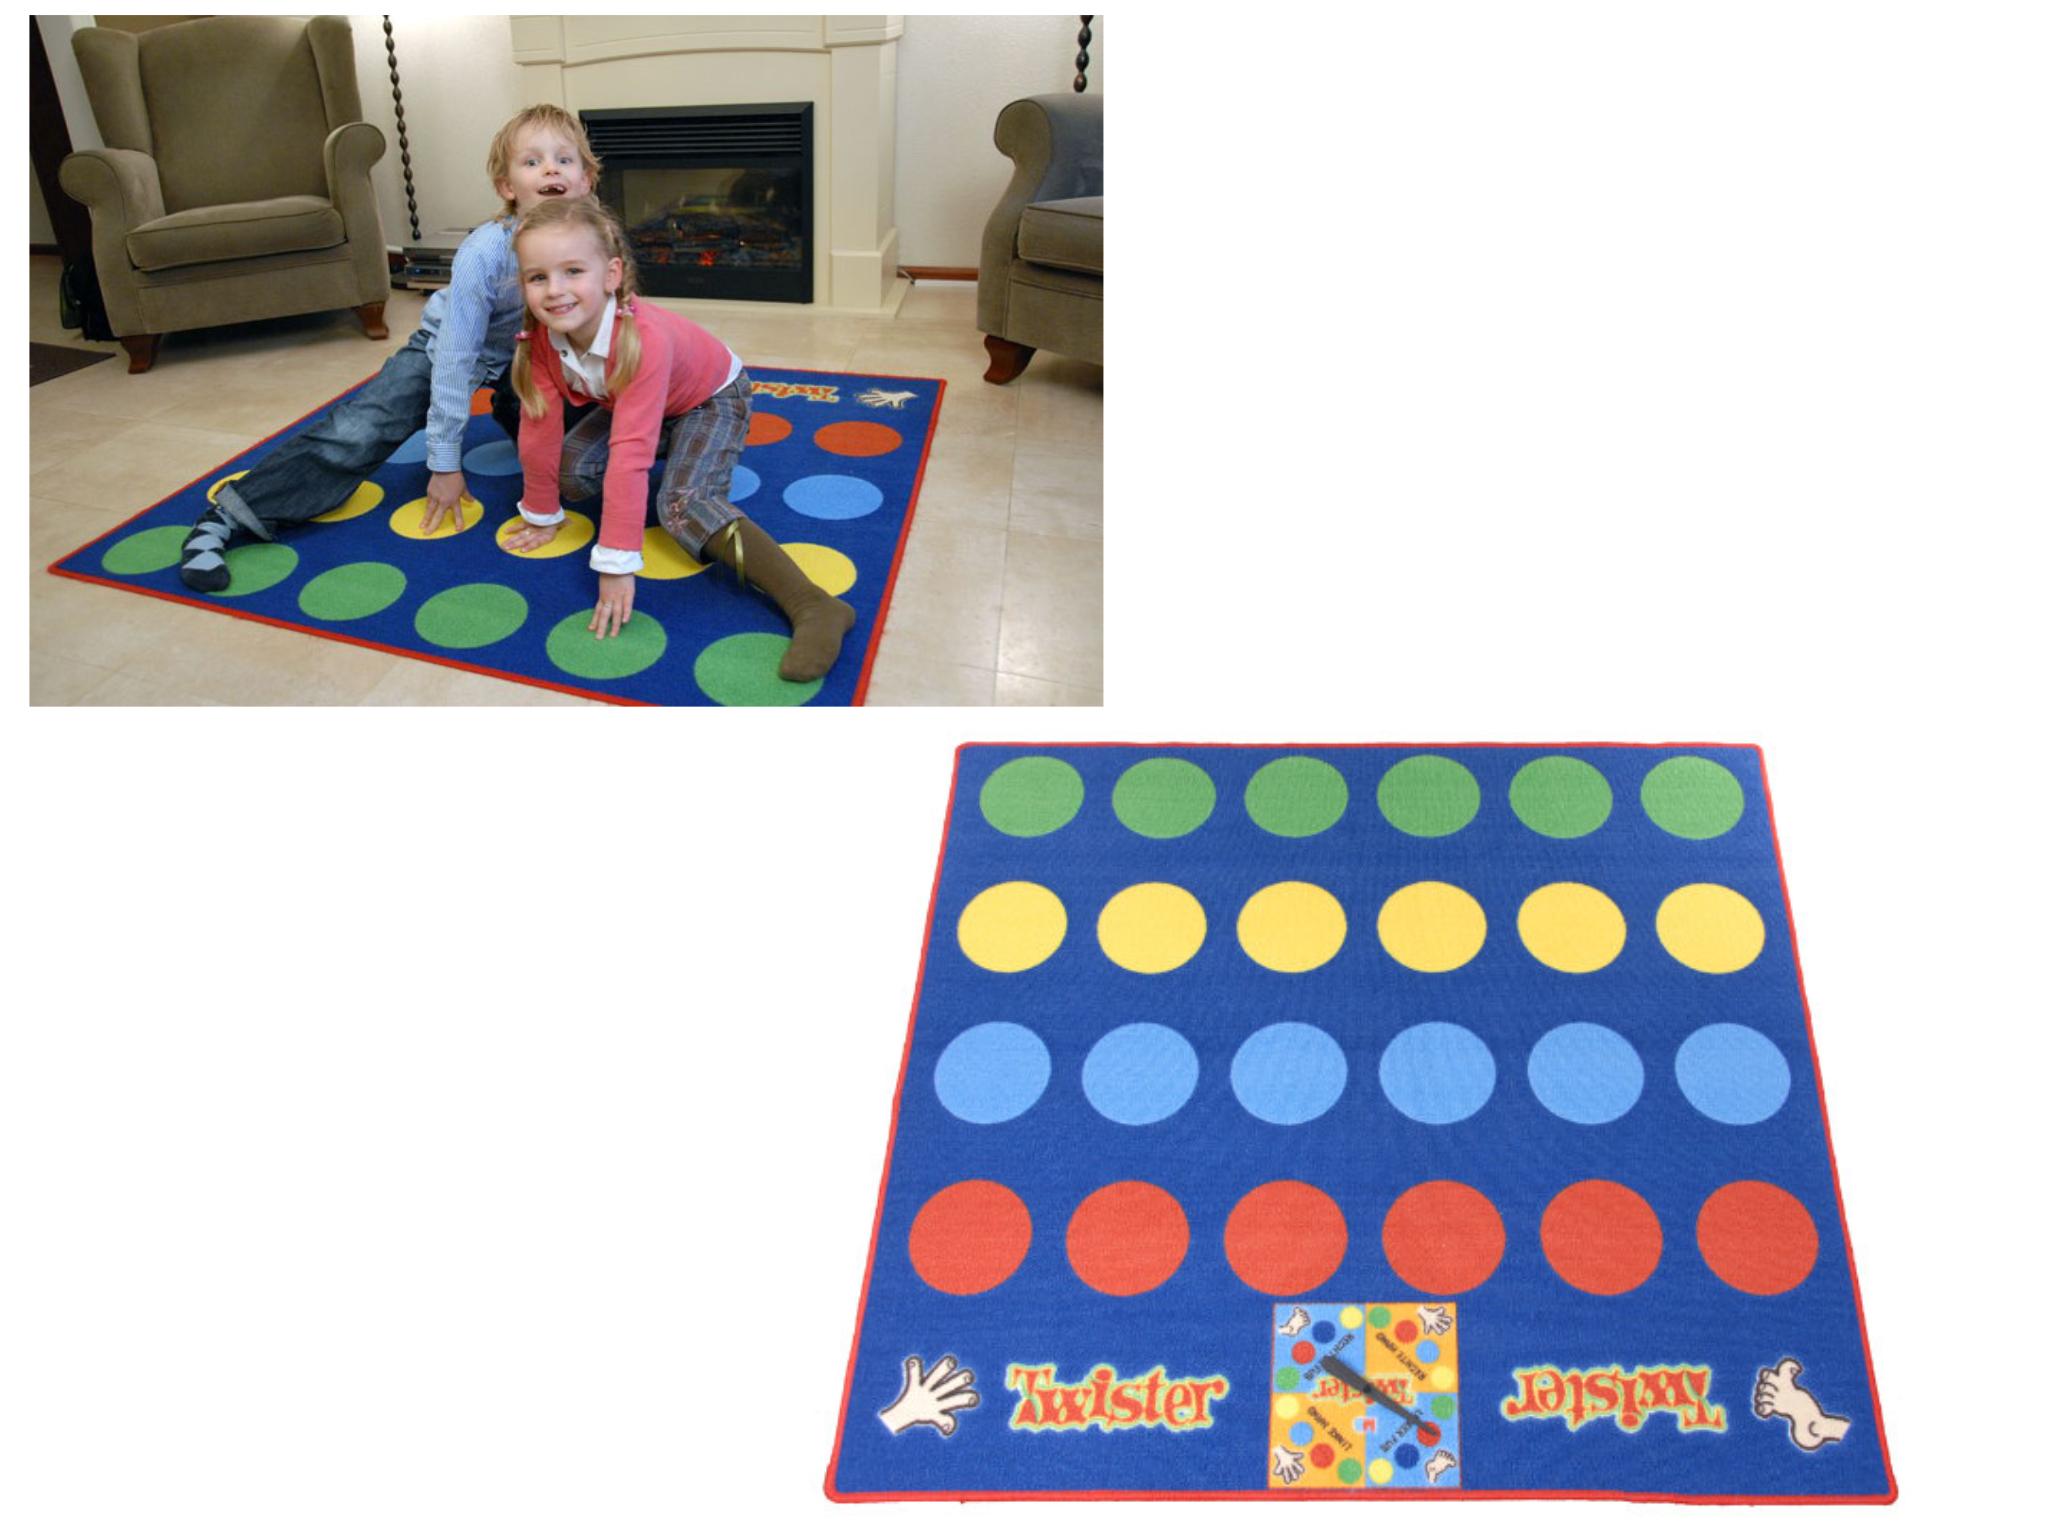 Speelkleed Twister132*145Cm  adv. 37,95